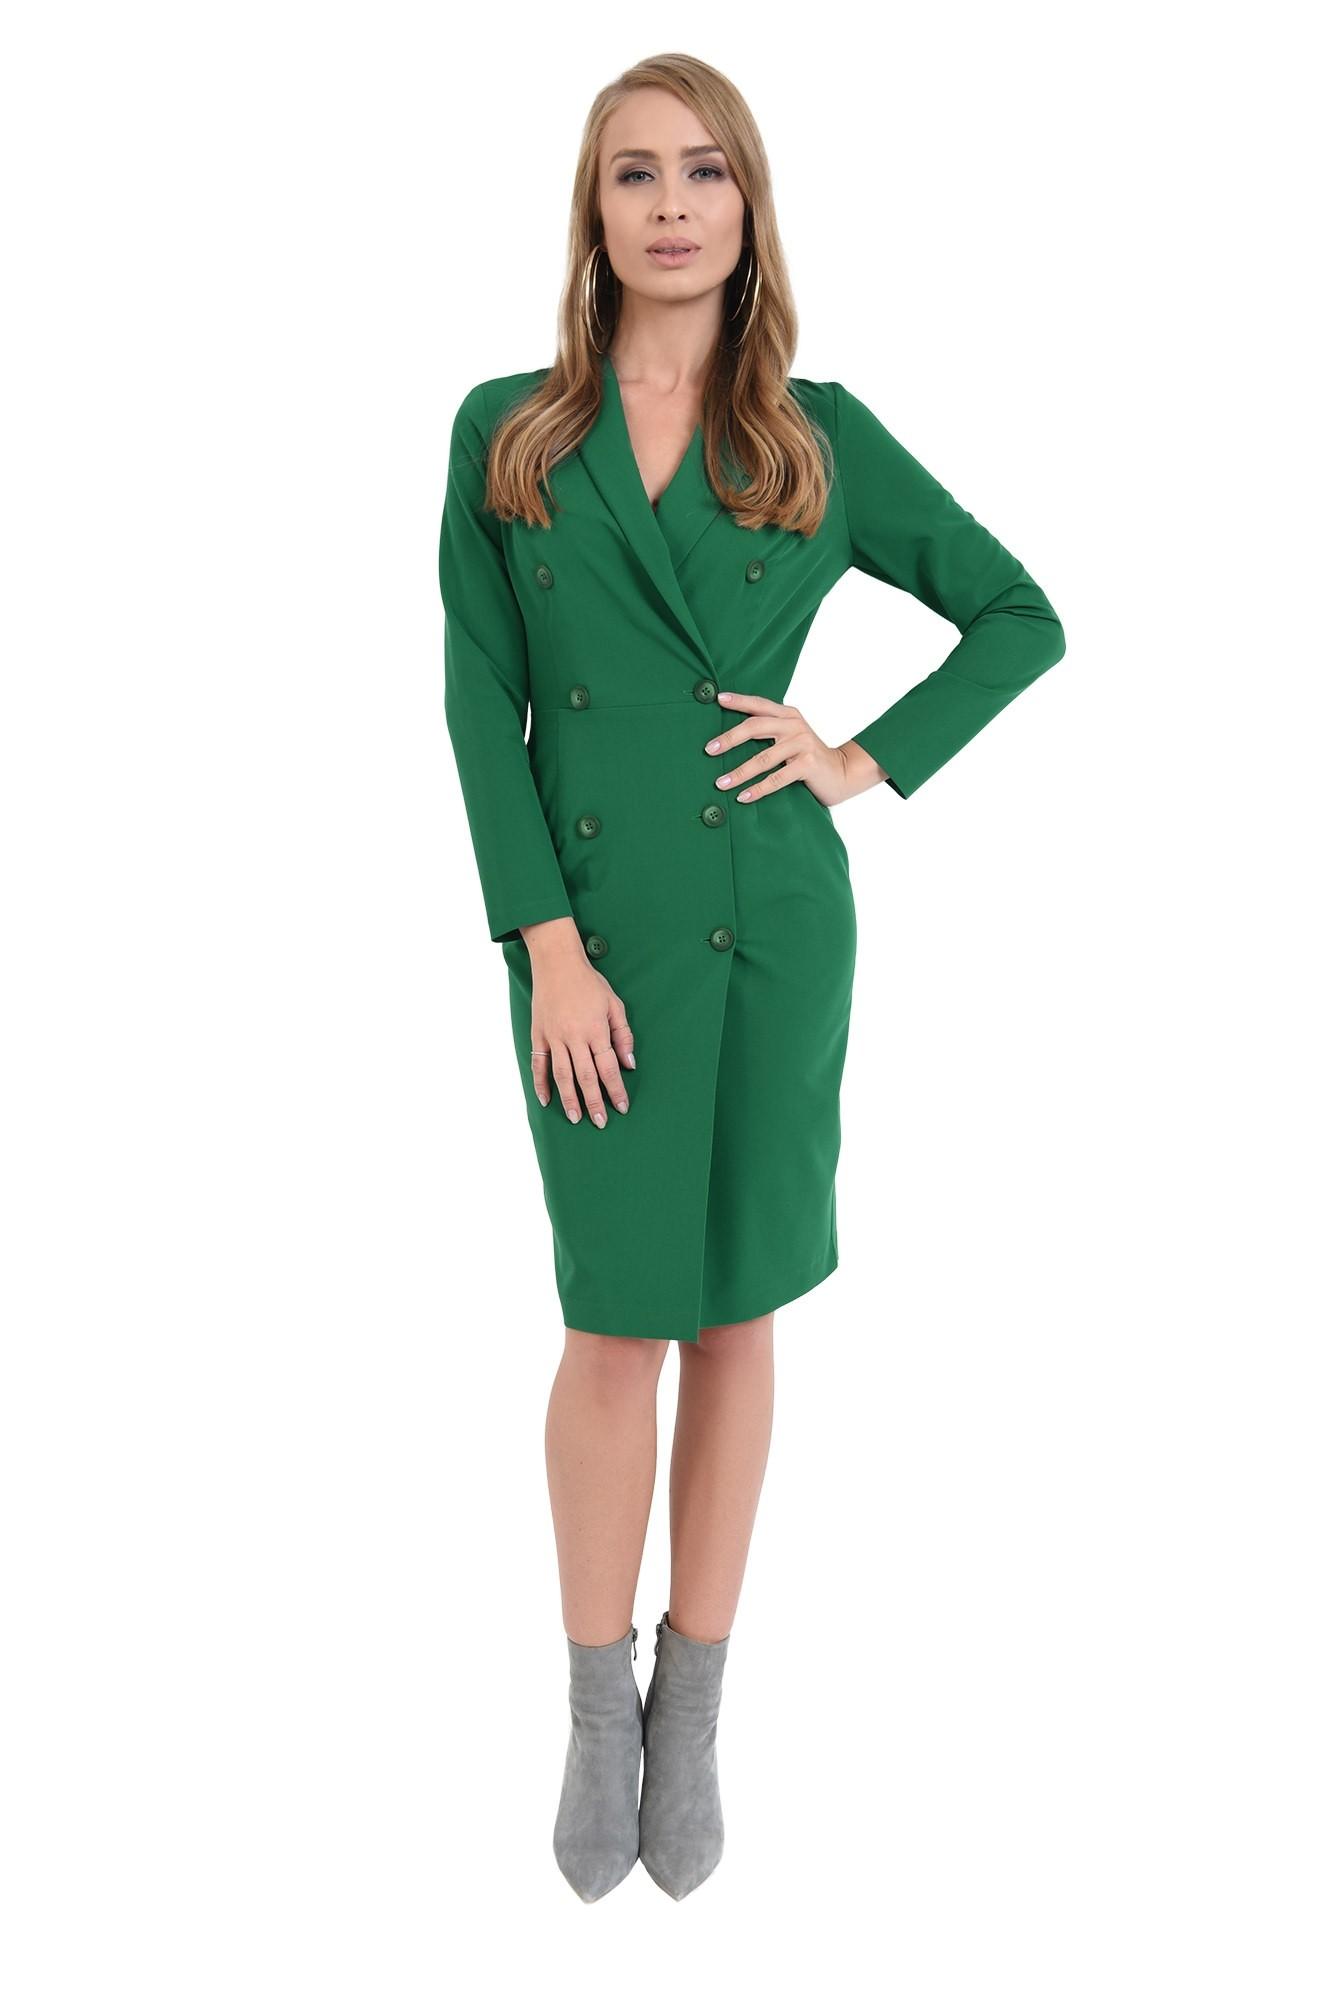 3 - 360 - rochie midi, verde, tip sacou